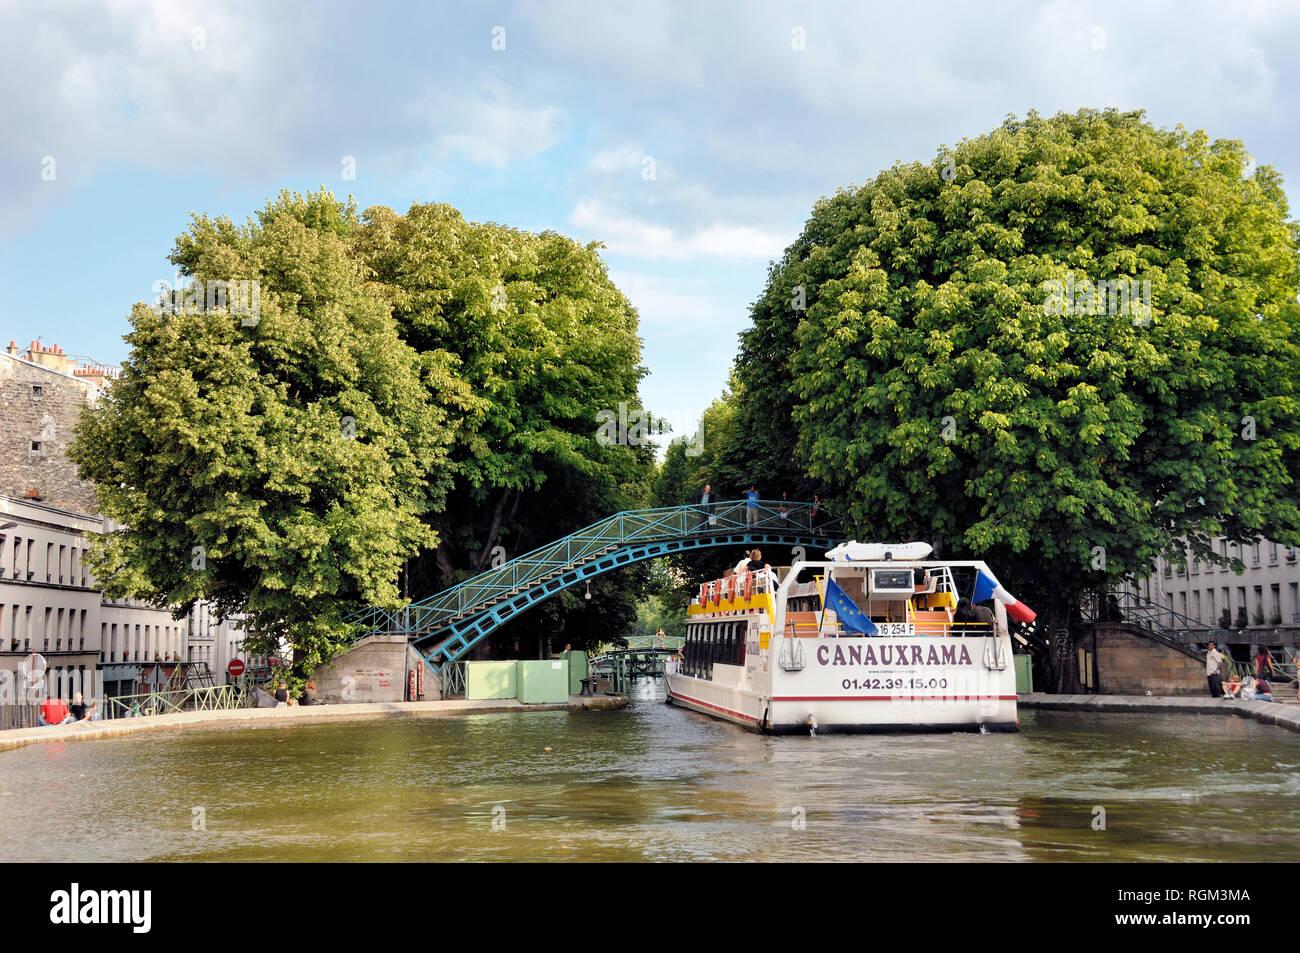 Viaje en barco o crucero por el Canal Saint-Martin París Francia Imagen De Stock